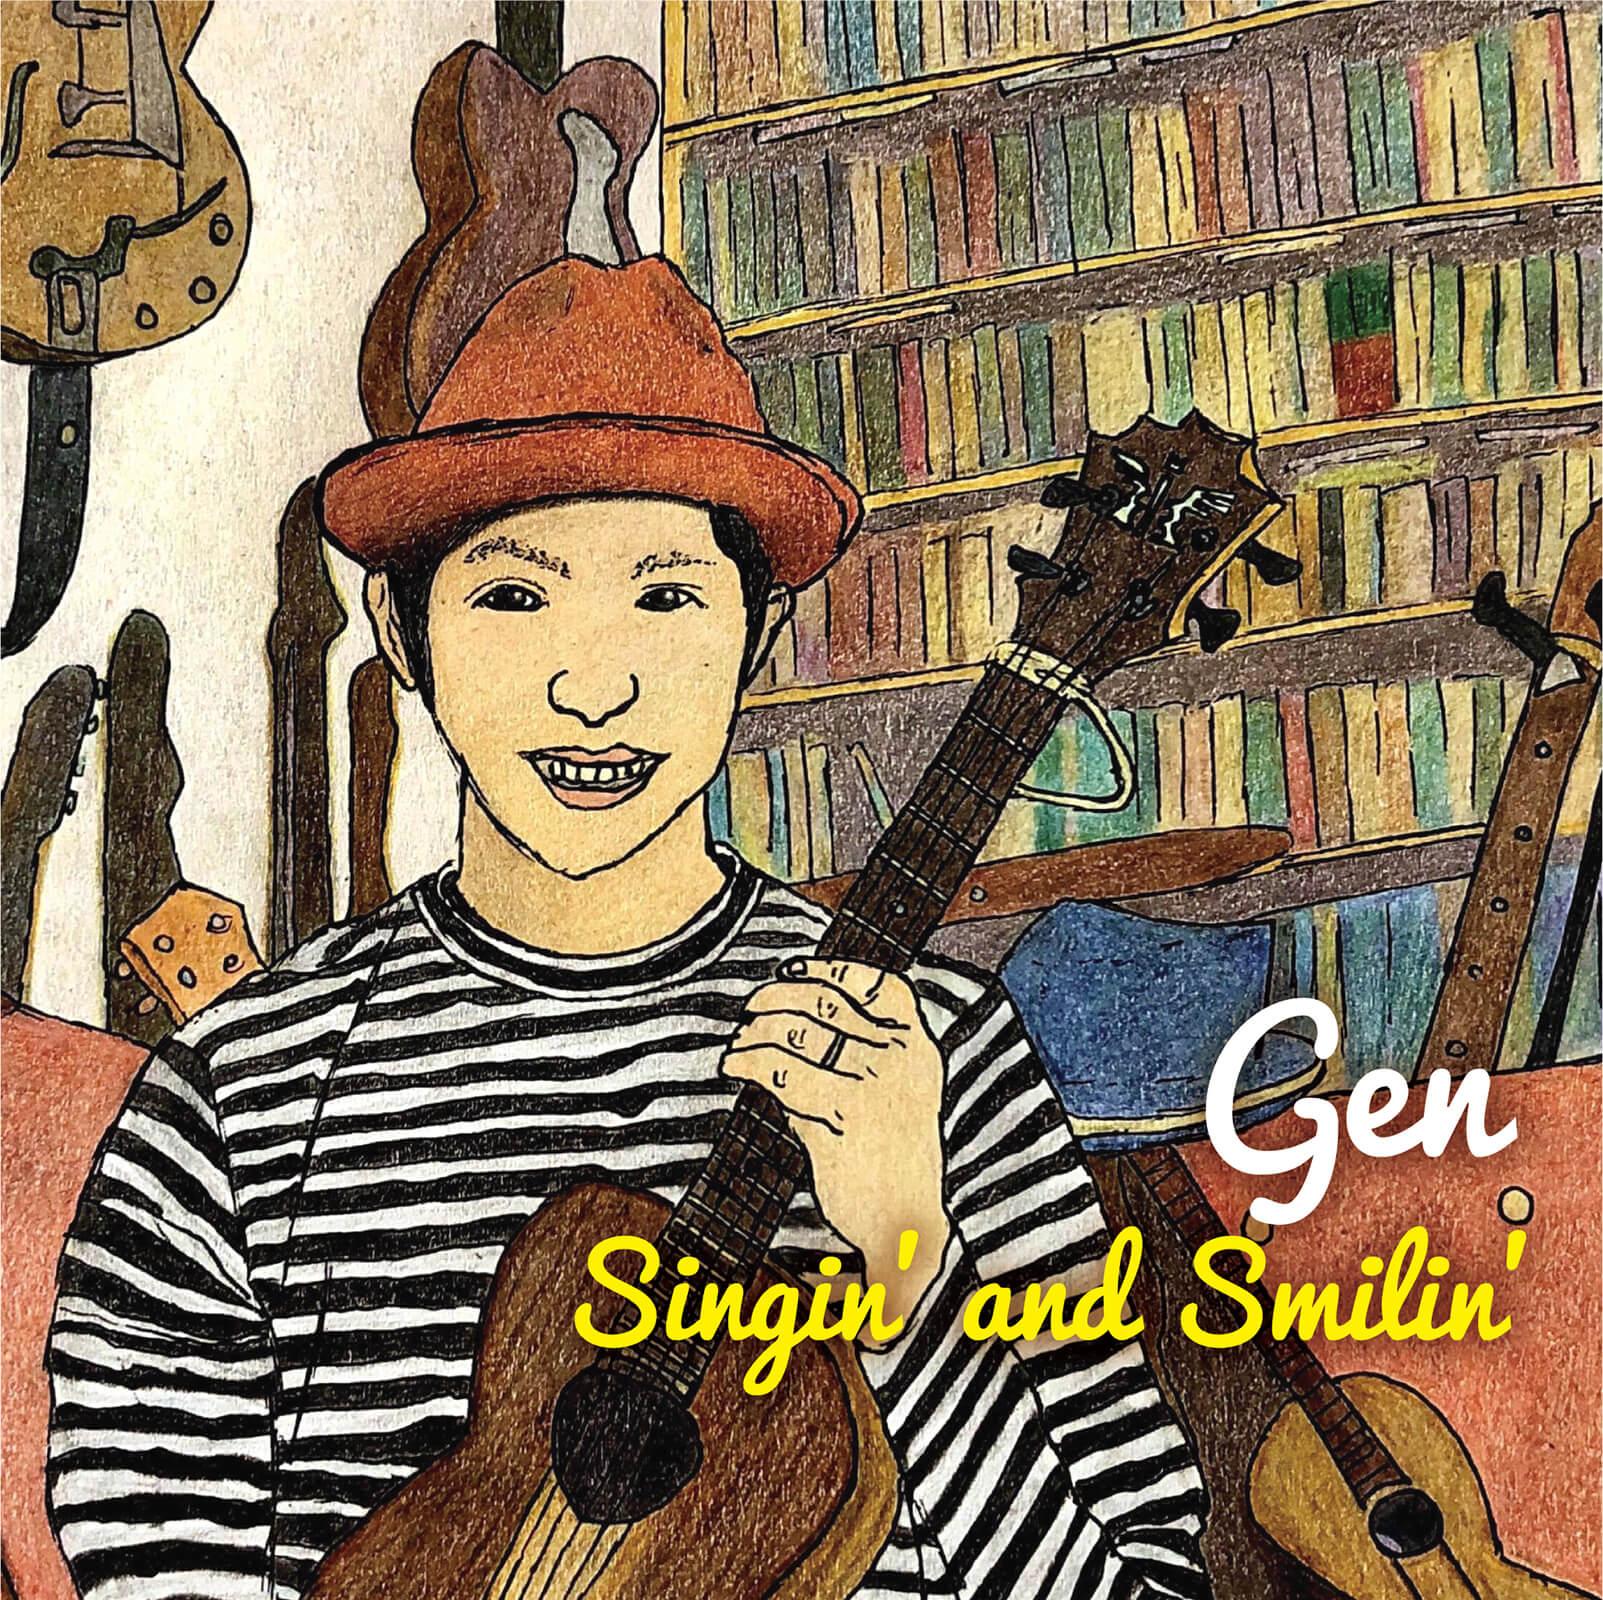 Singin' and Smilin'